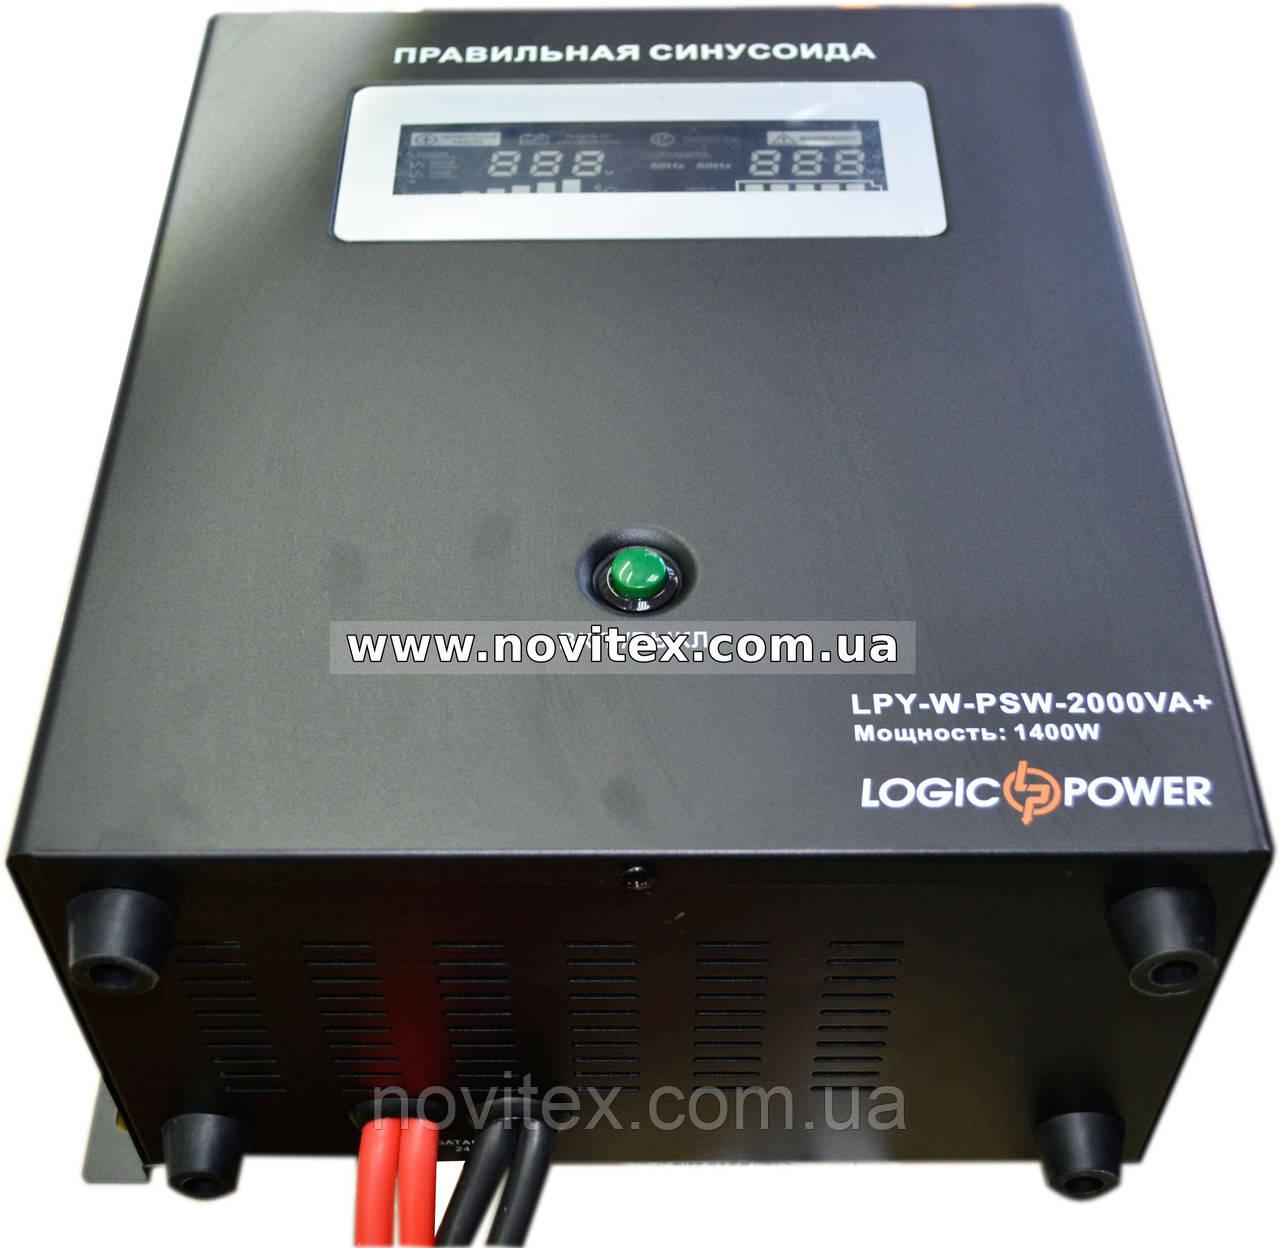 ИБП Logicpower LPY-W-PSW-2000+ (1400Вт) 24V